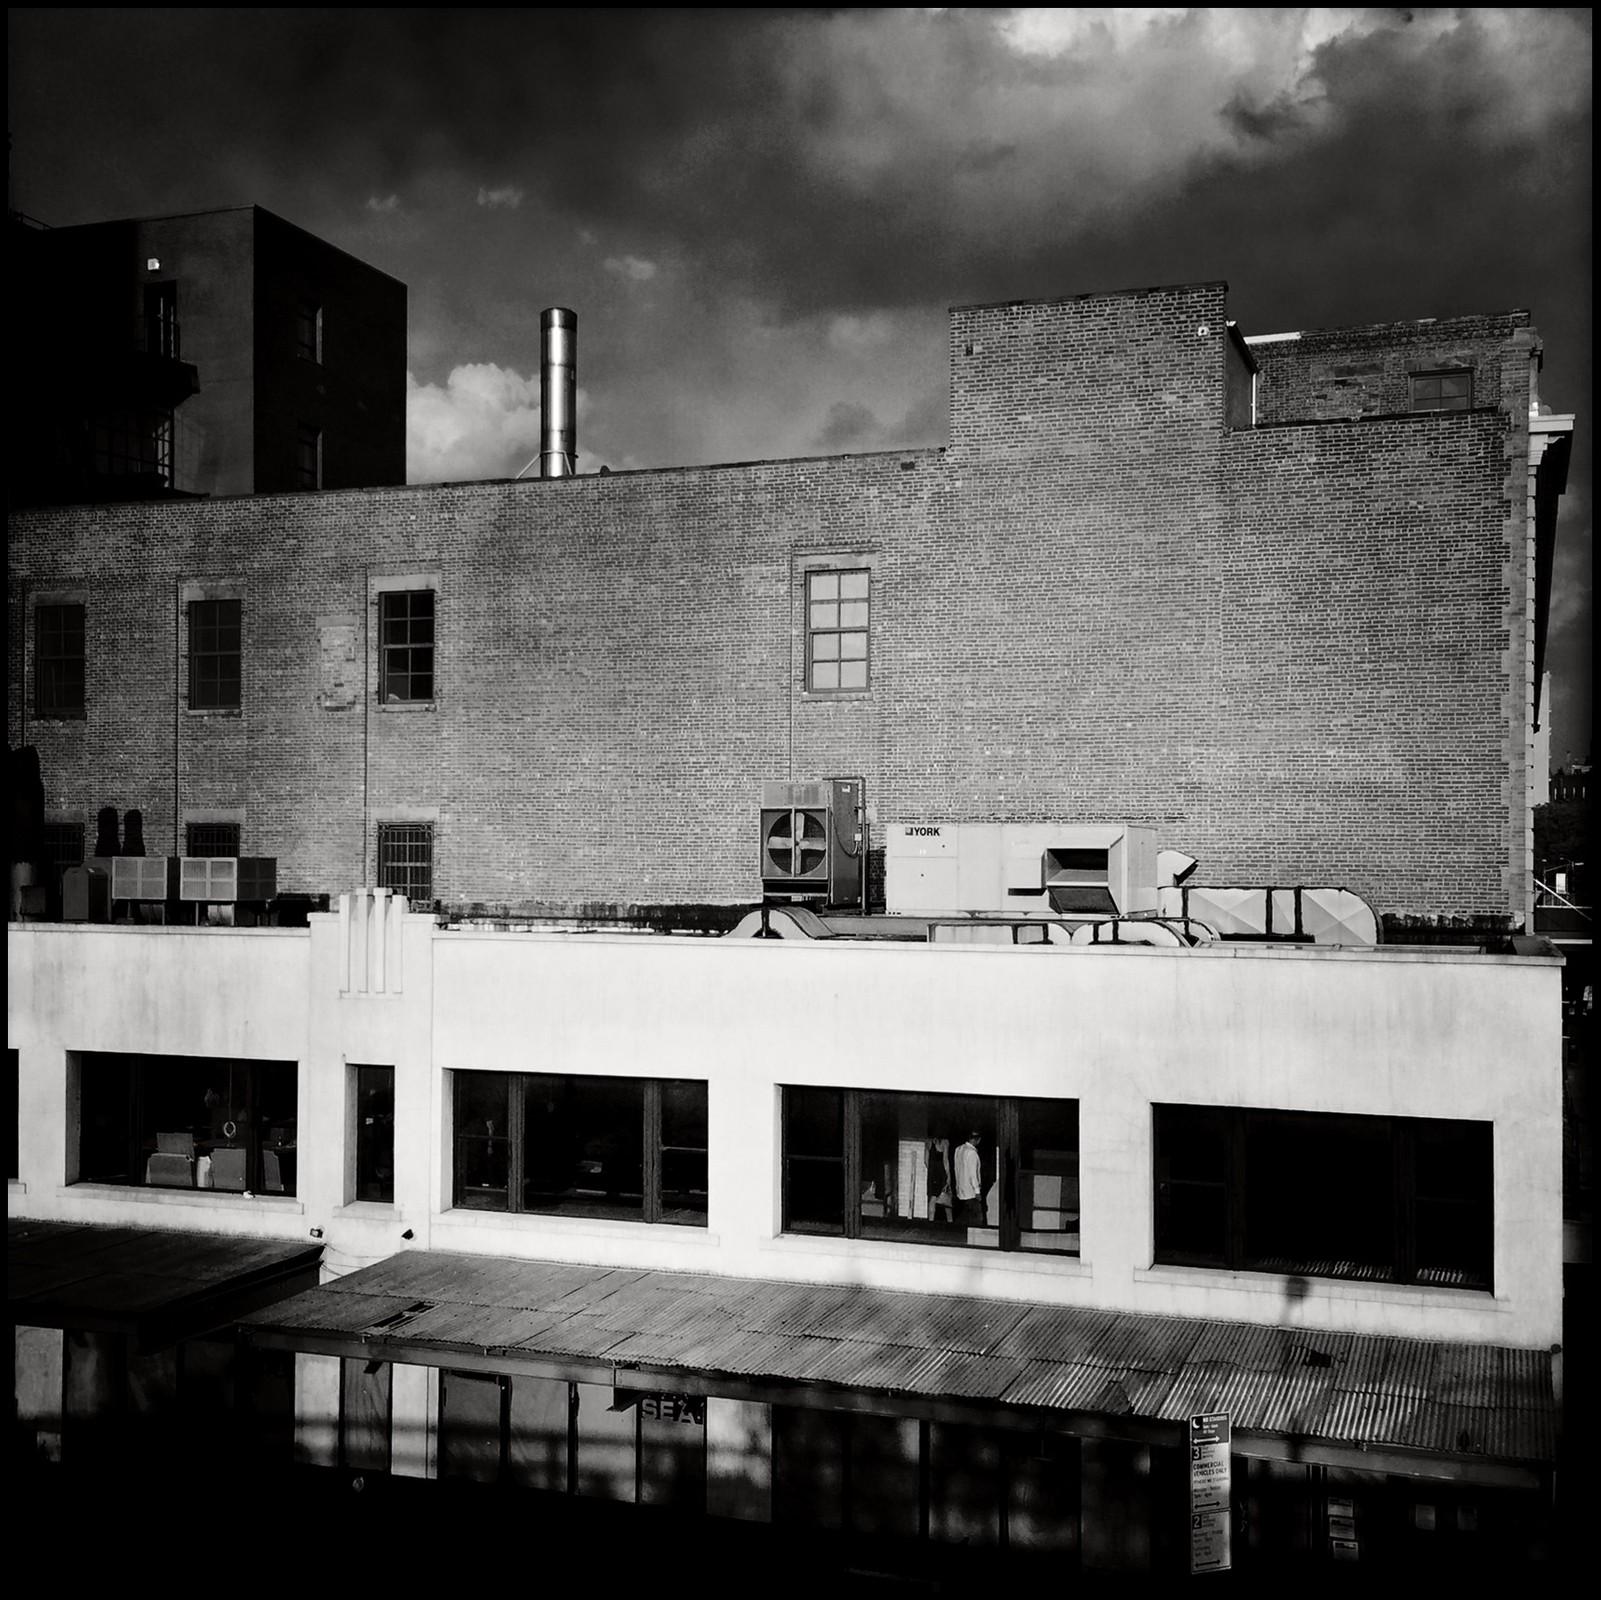 High Line - New York City - 06.22.2015